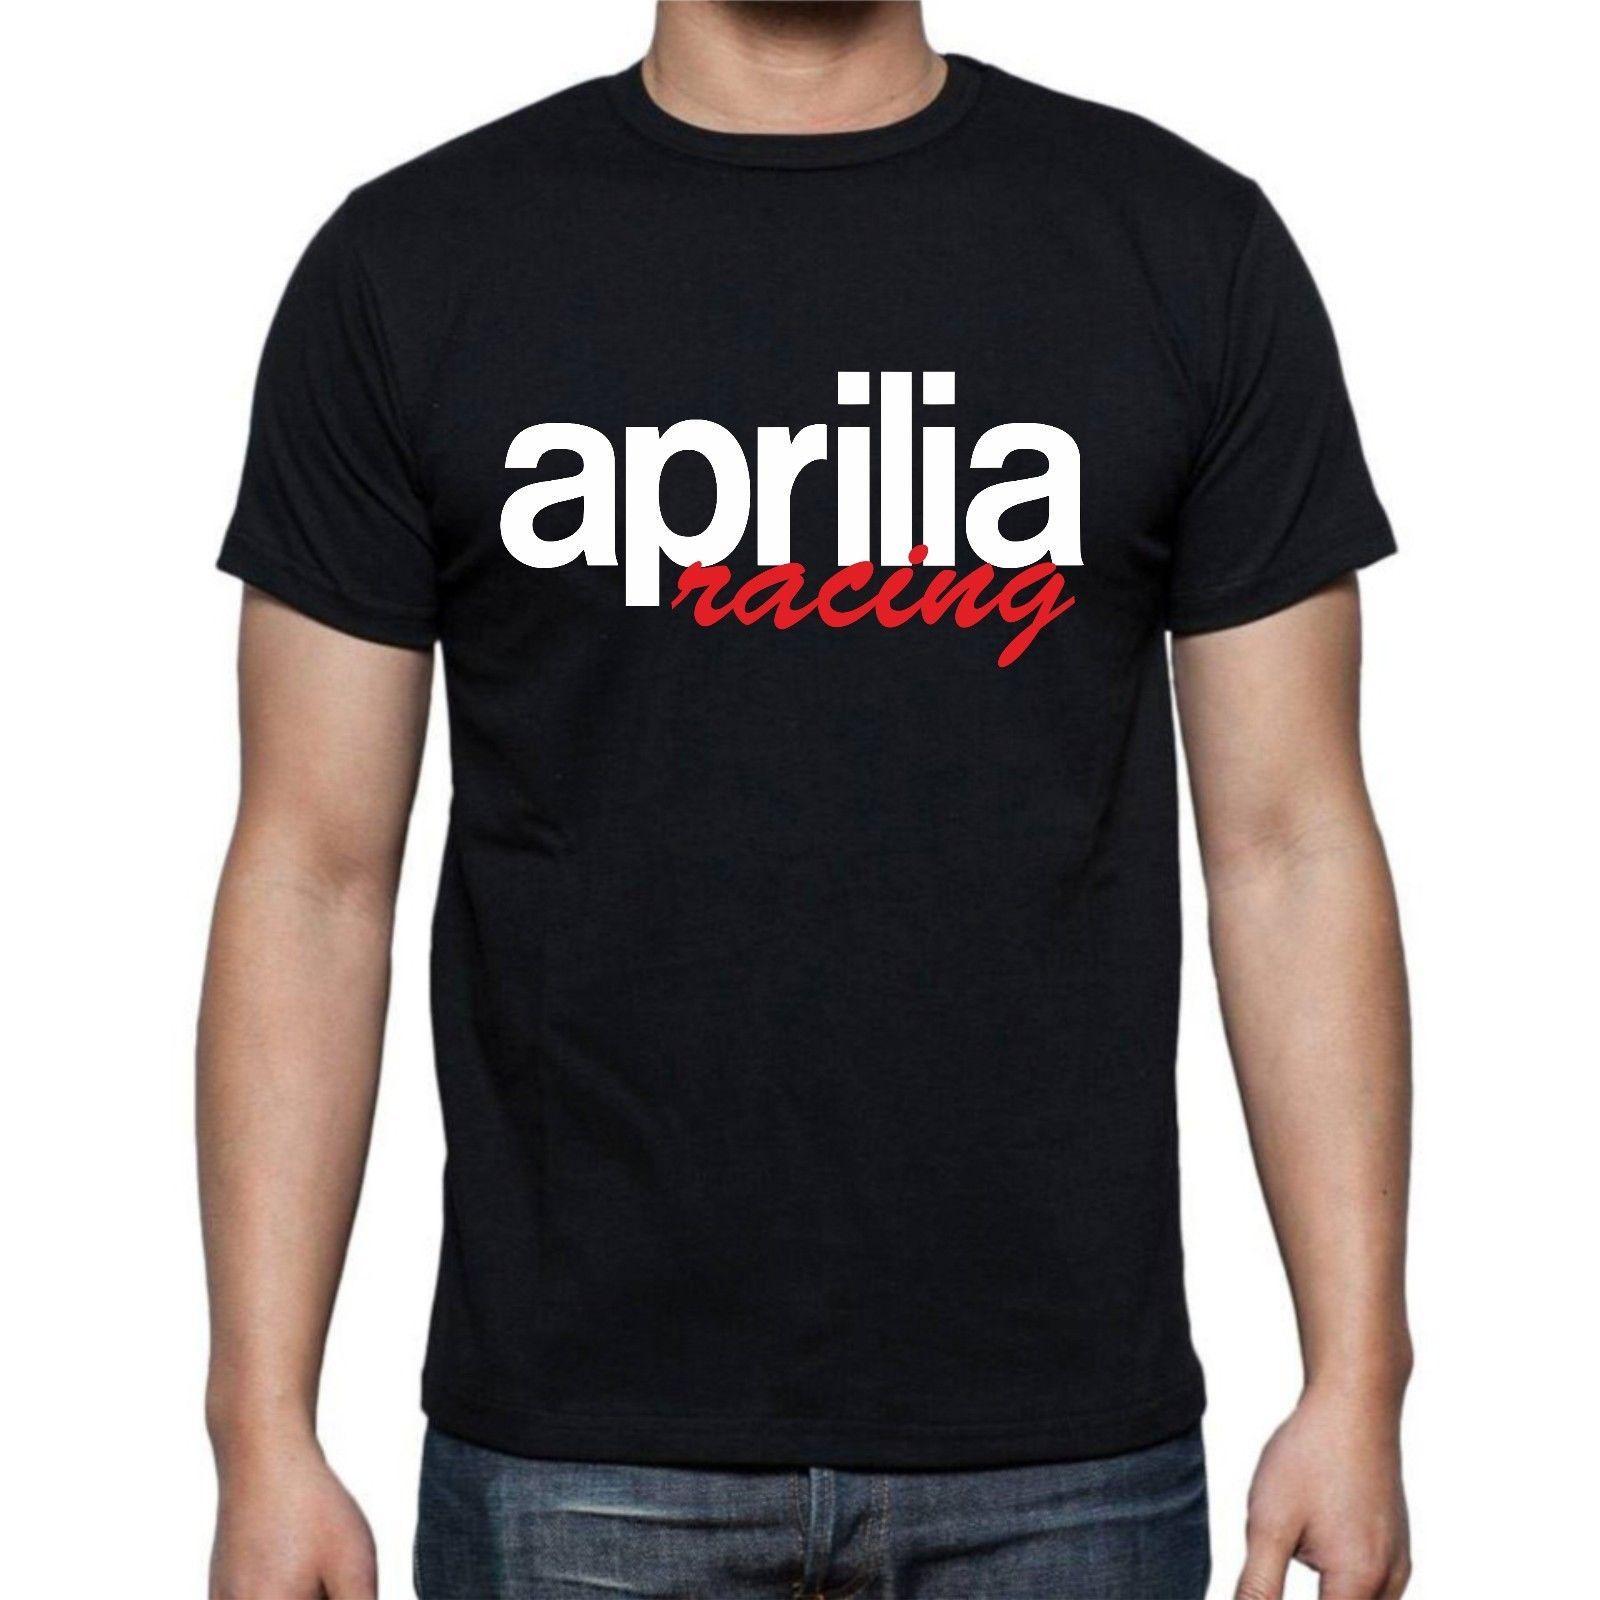 d3468850c Aprilia T Shirt Racer Motorbike Motosport Online Shop T Shirt Shirts  Designer From Csndicestore, $24.2| DHgate.Com